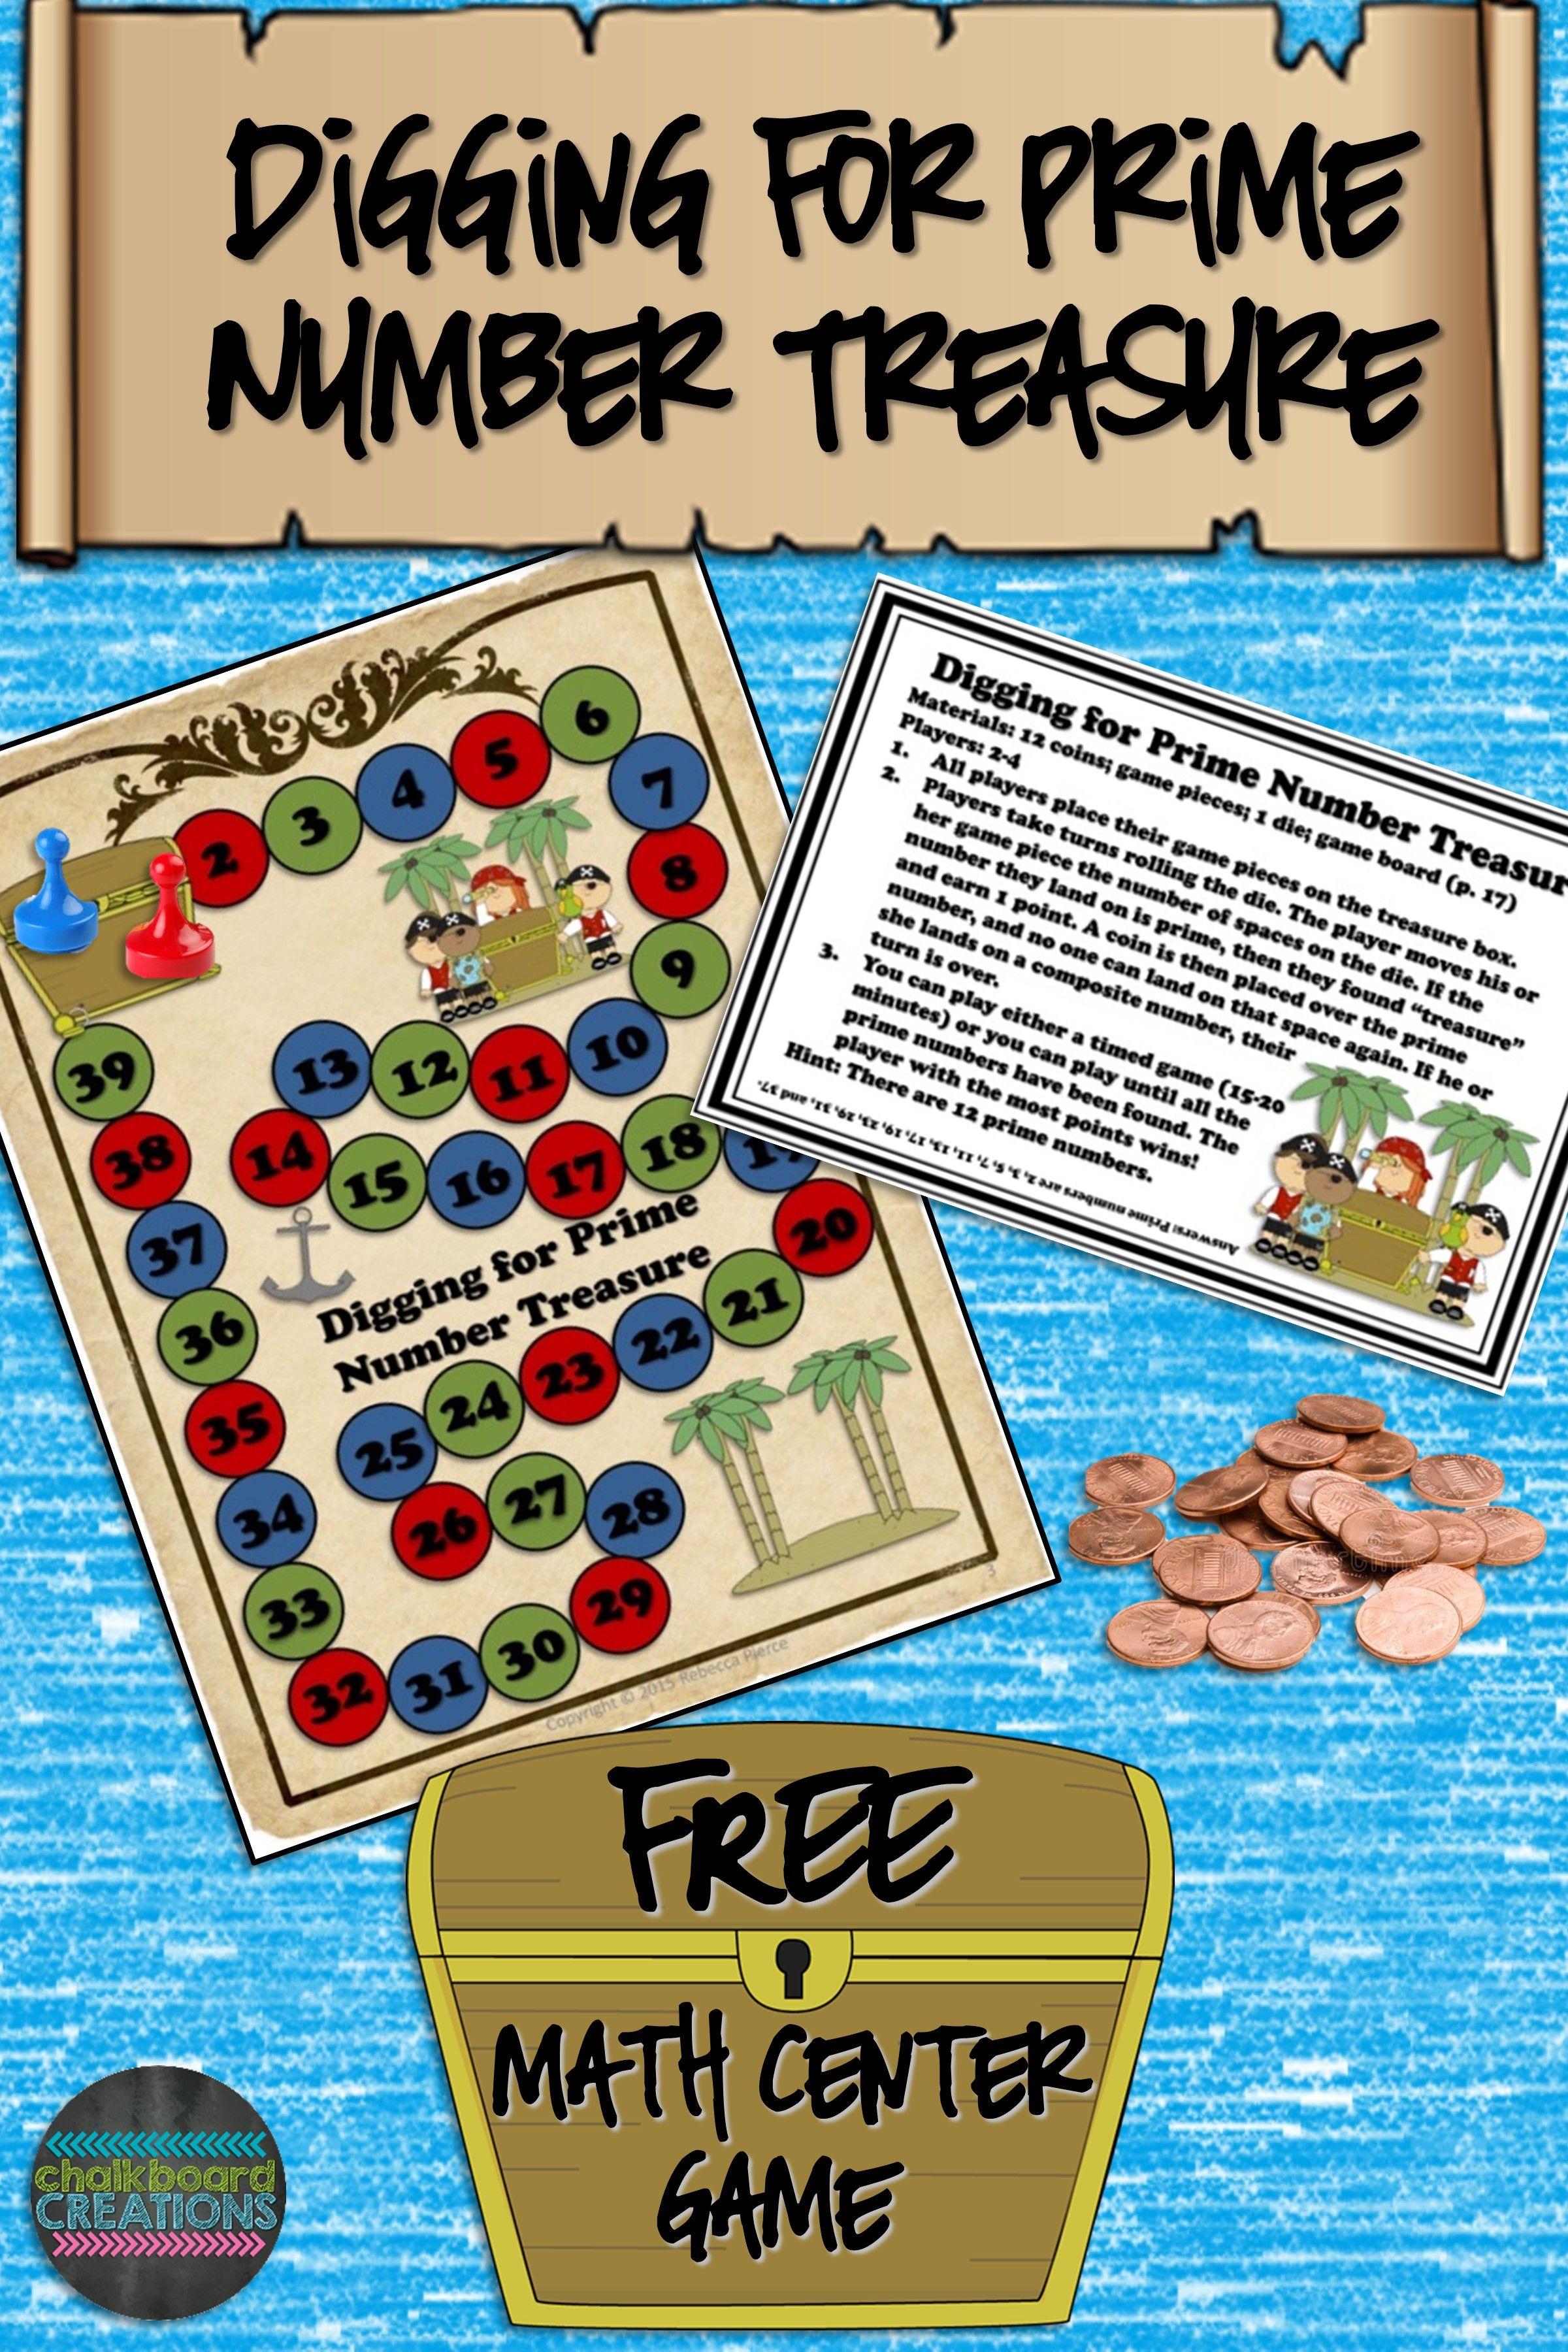 Free Math Center Game Digging For Prime Number Treasure